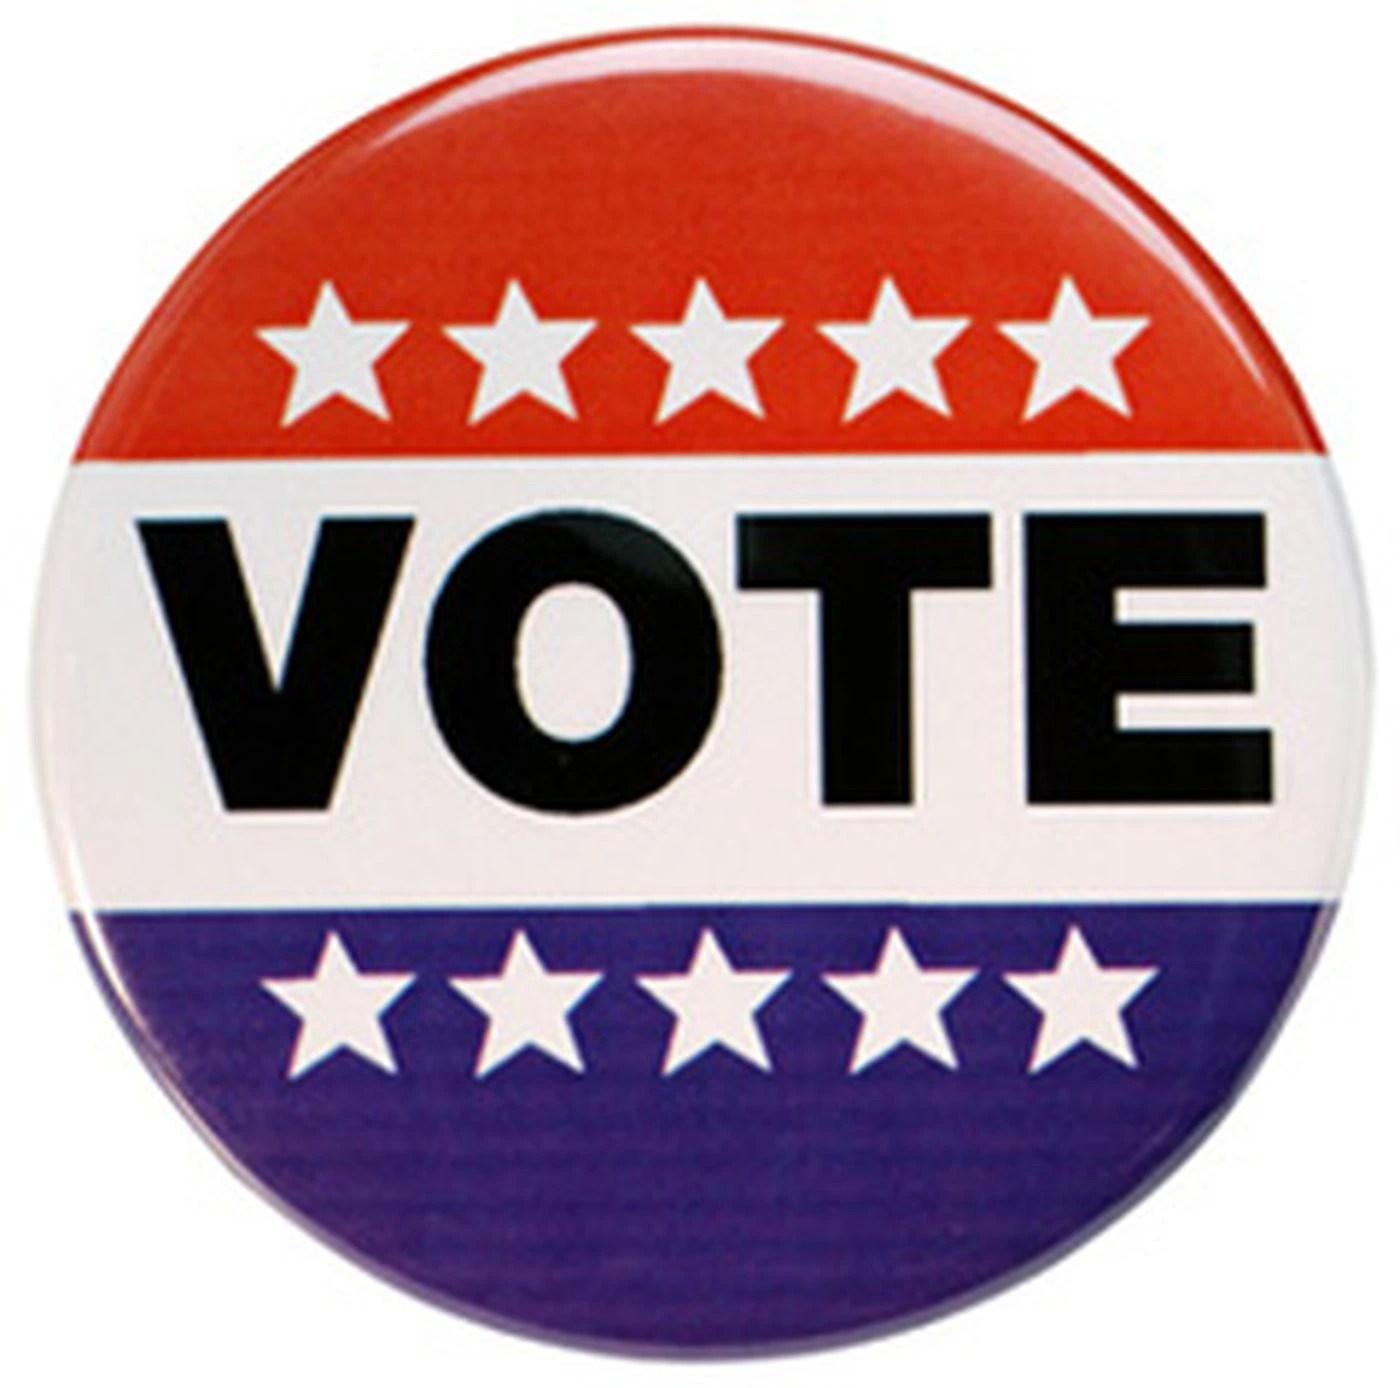 Image result for vote sign